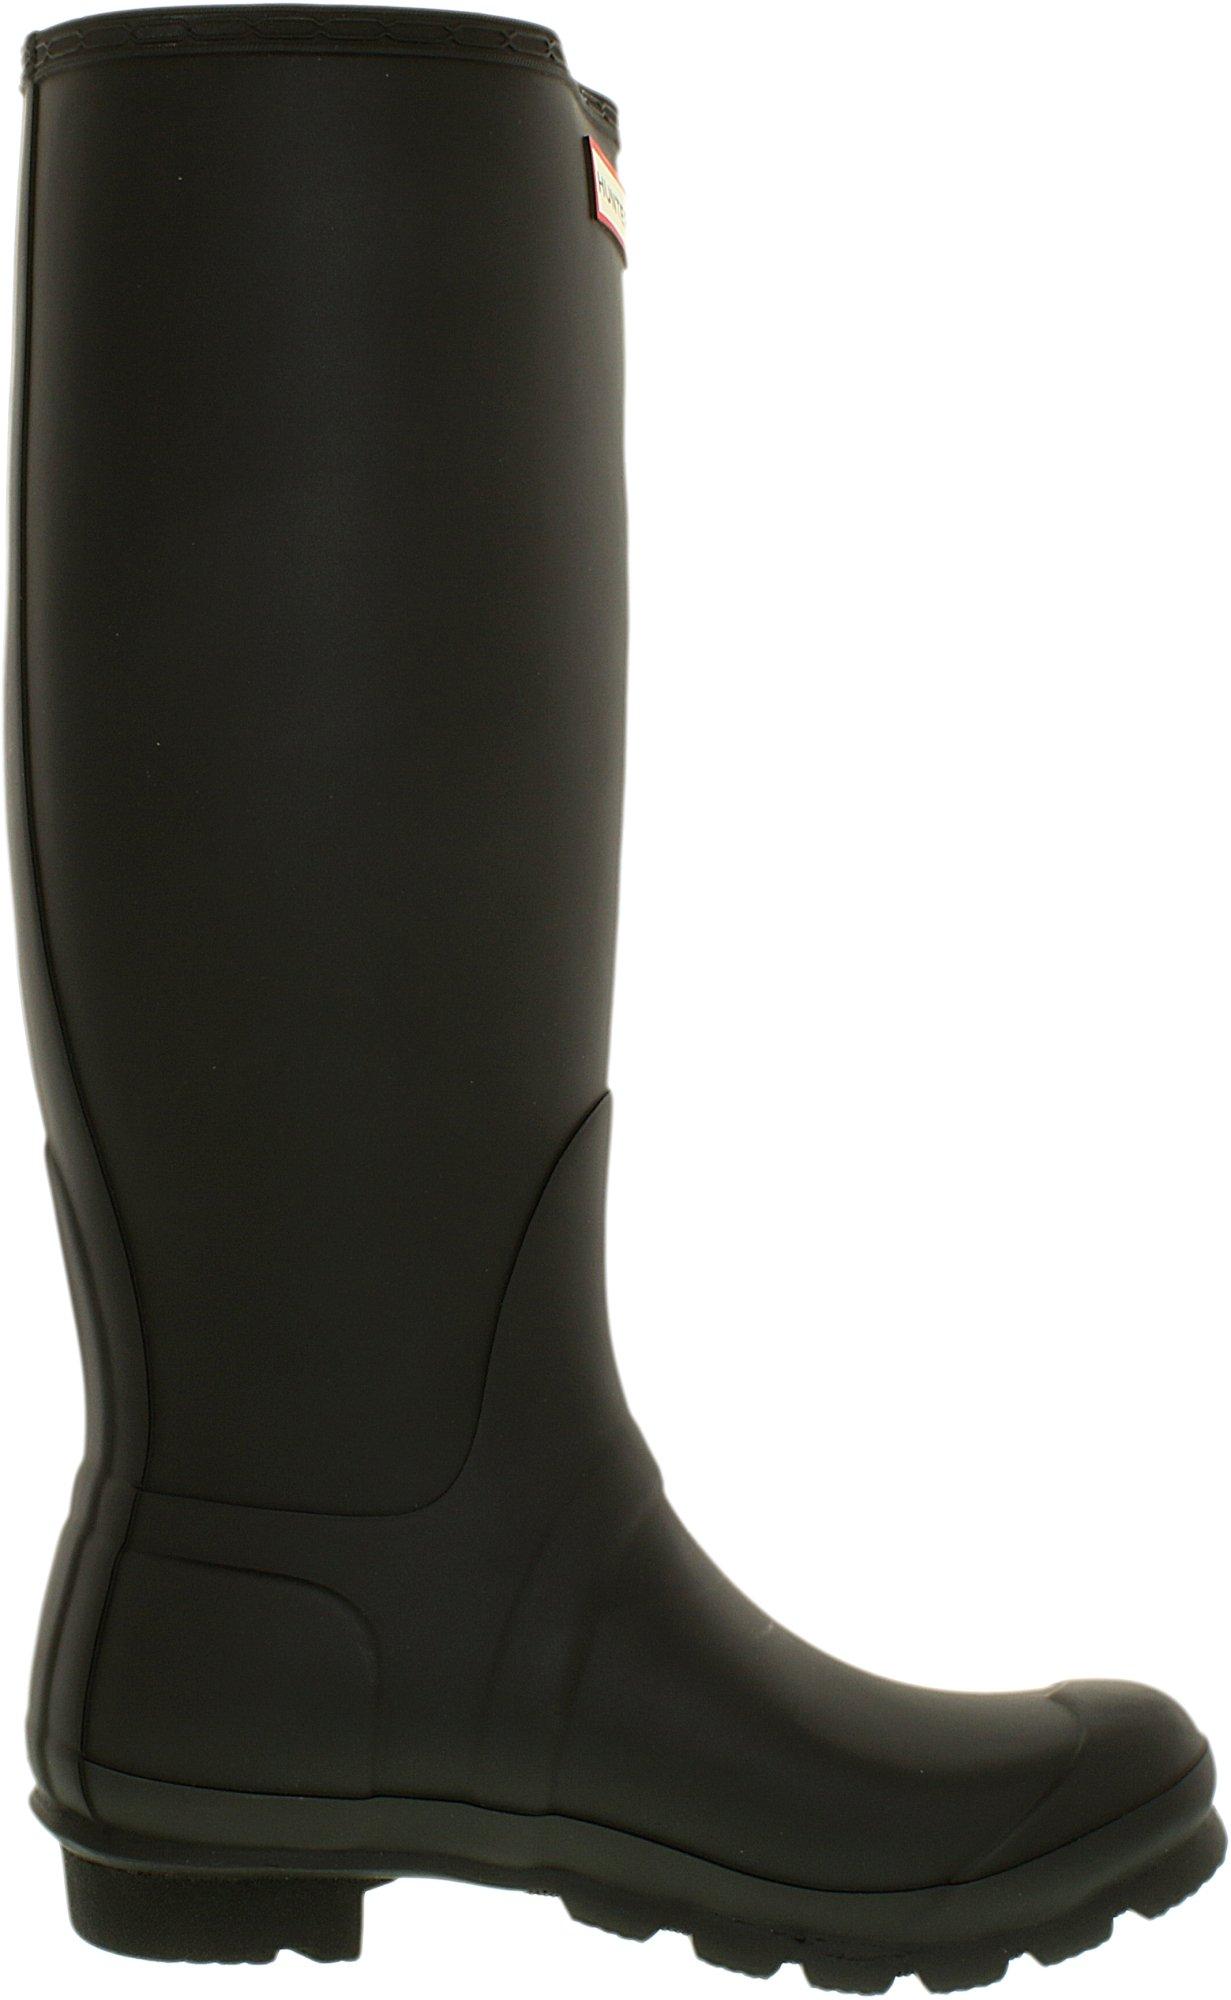 Hunter-Original-Tall-Rubber-Rain-Boot thumbnail 6